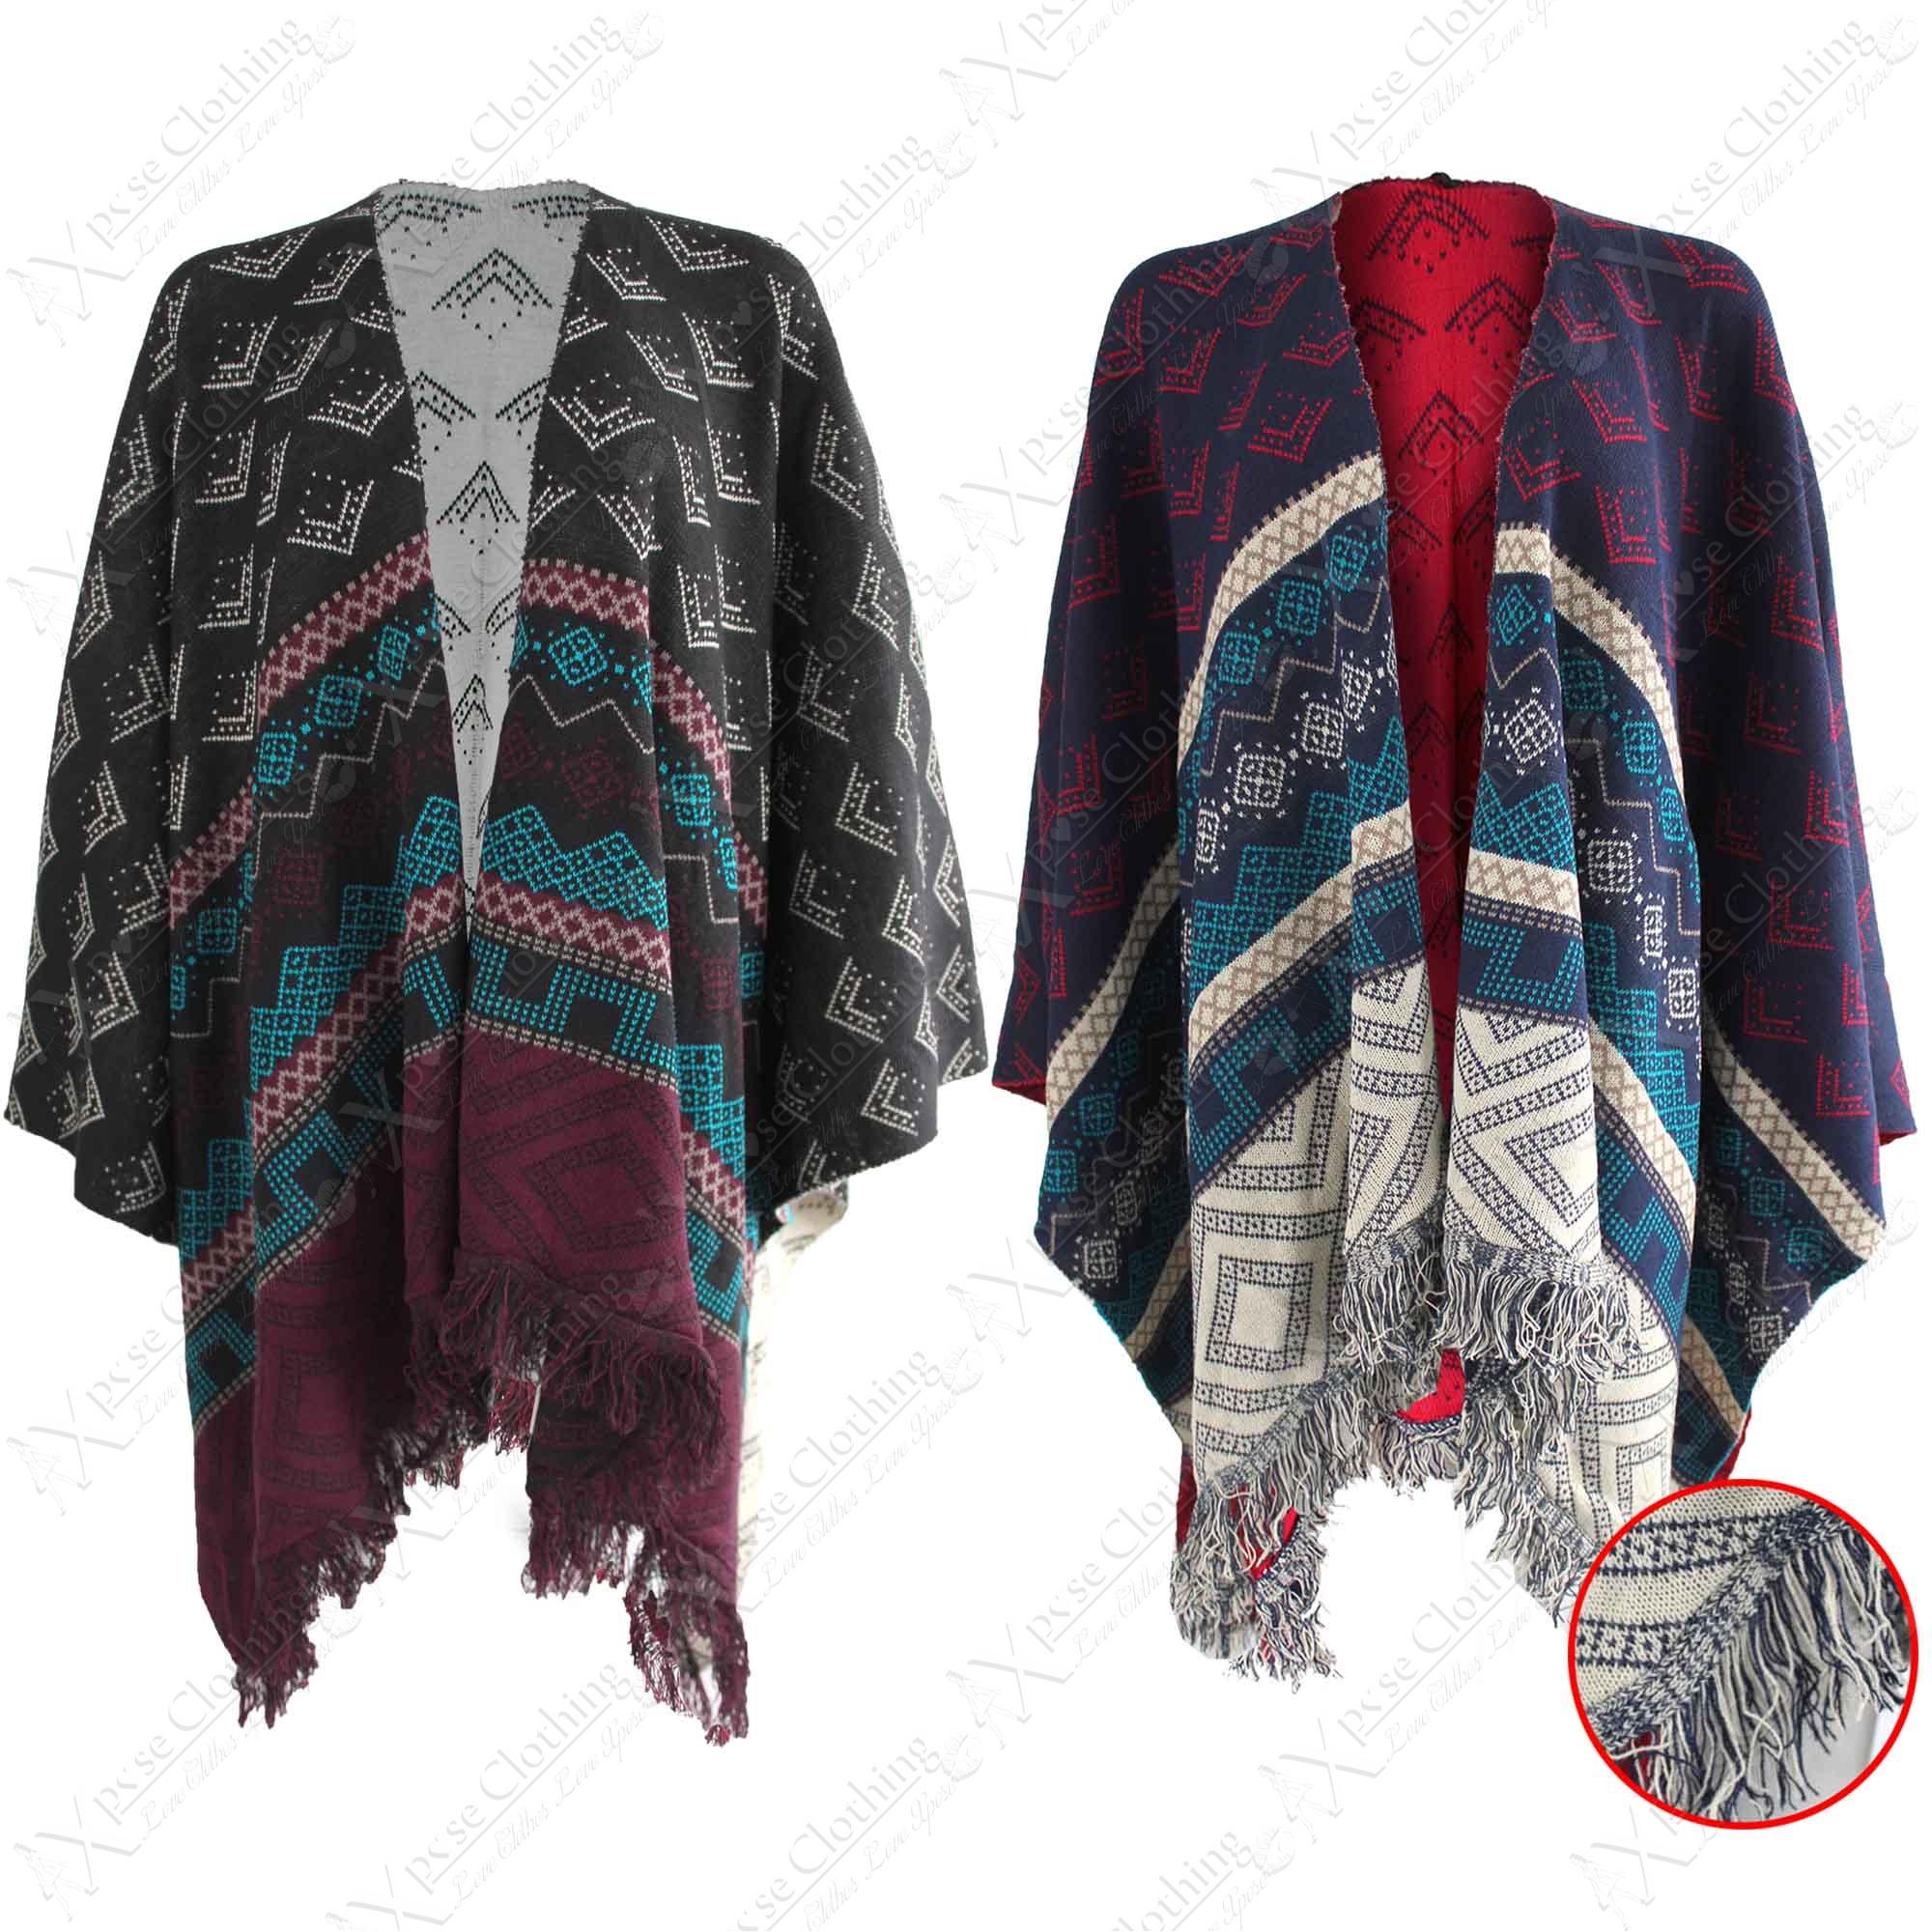 REVERSABLE AZTEC PRINT KNITTED CAPE WOMEN WARM BLANKET WRAP FRINGE KIMONO PON...